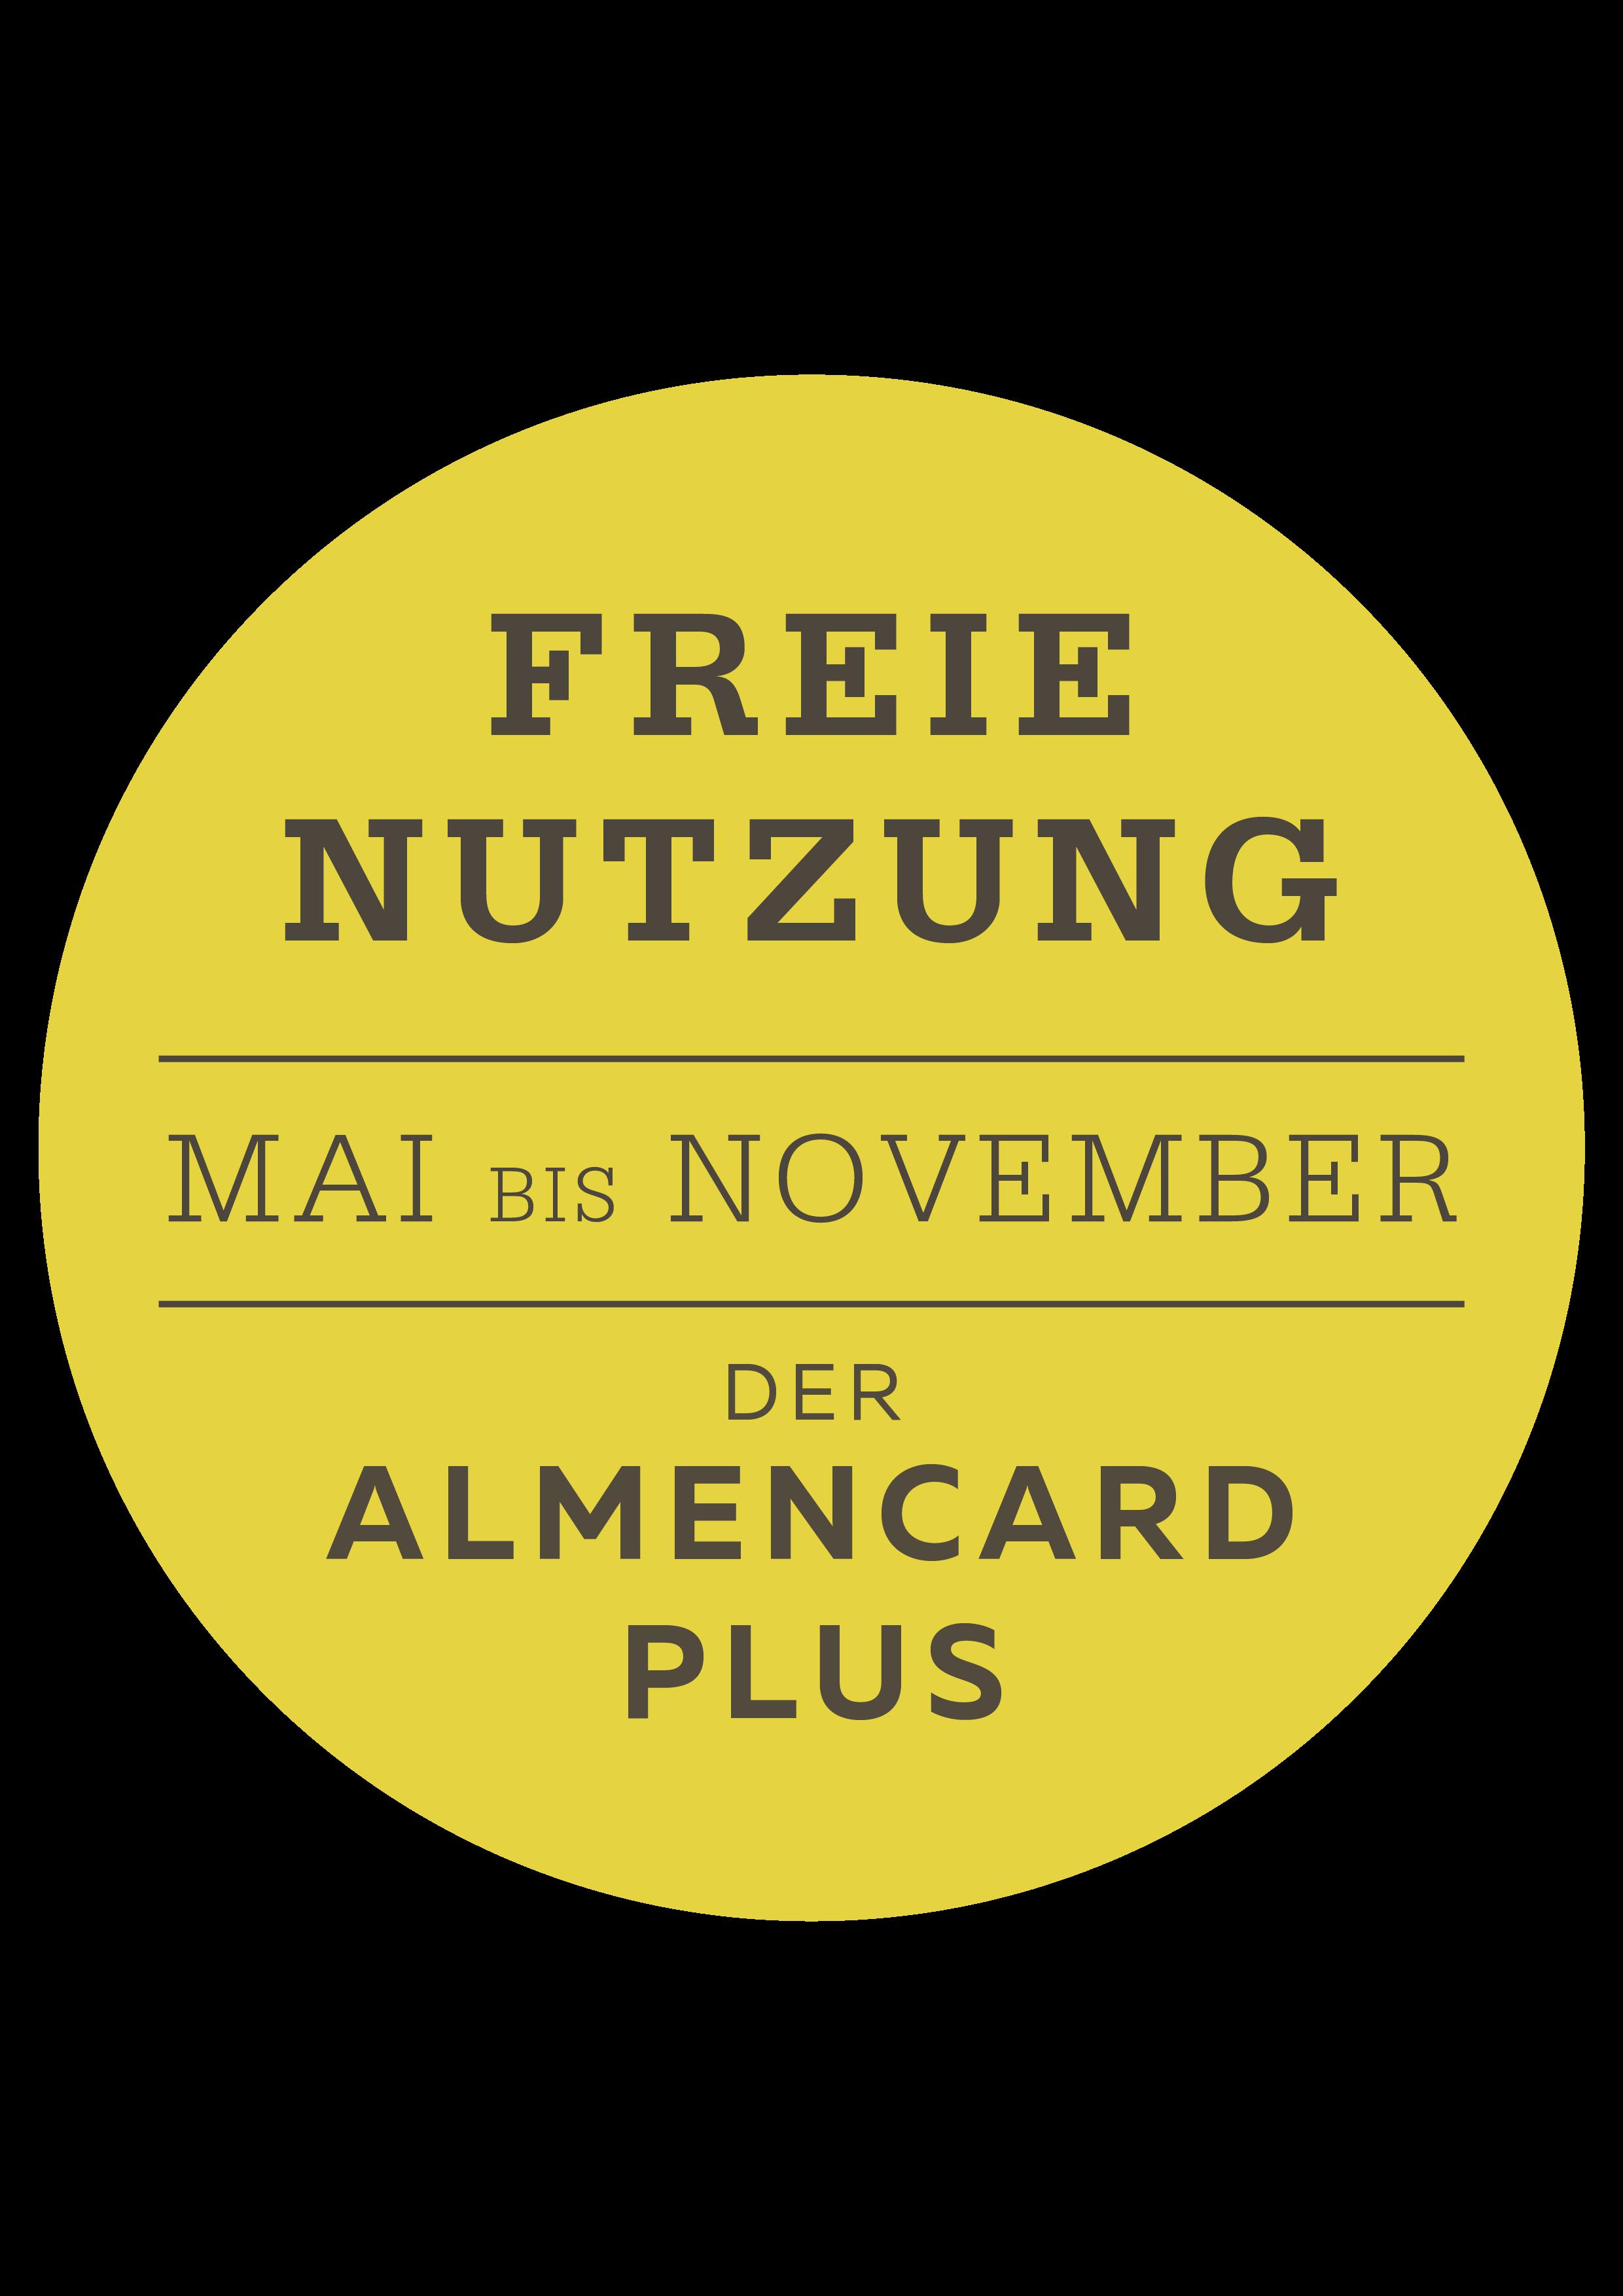 almencardplus_de.png